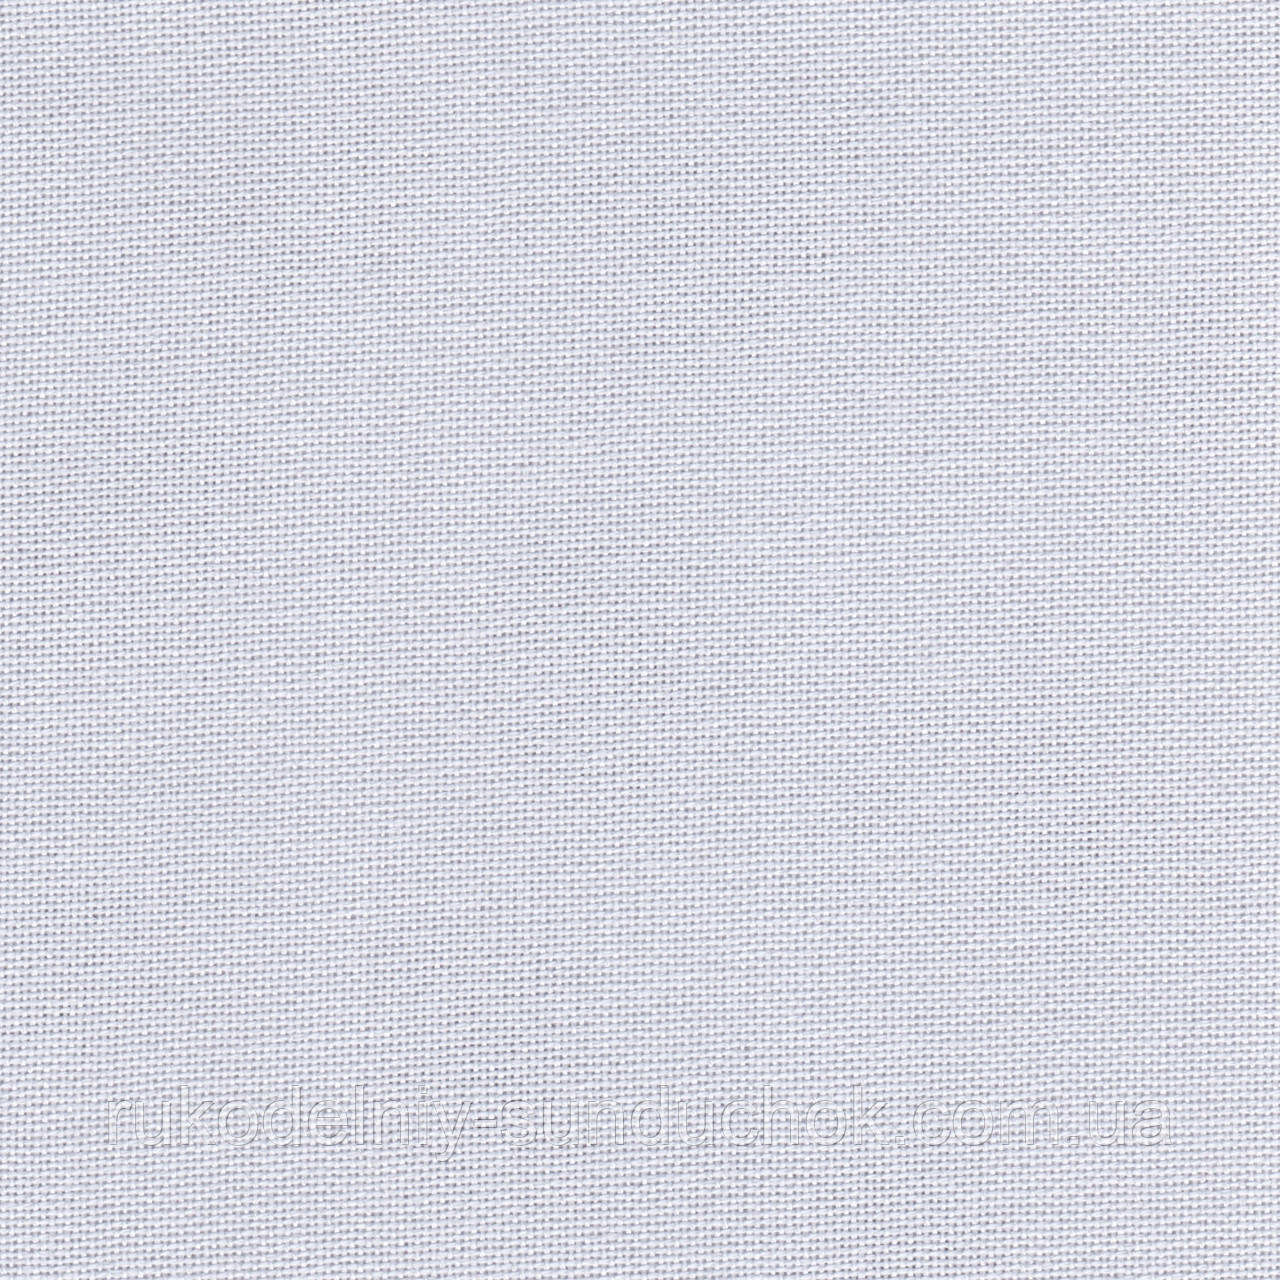 Ткань равномерного переплетения Zweigart Murano Lugana 32 ct. 3984/7011 Silvery Moon (лунное серебро)